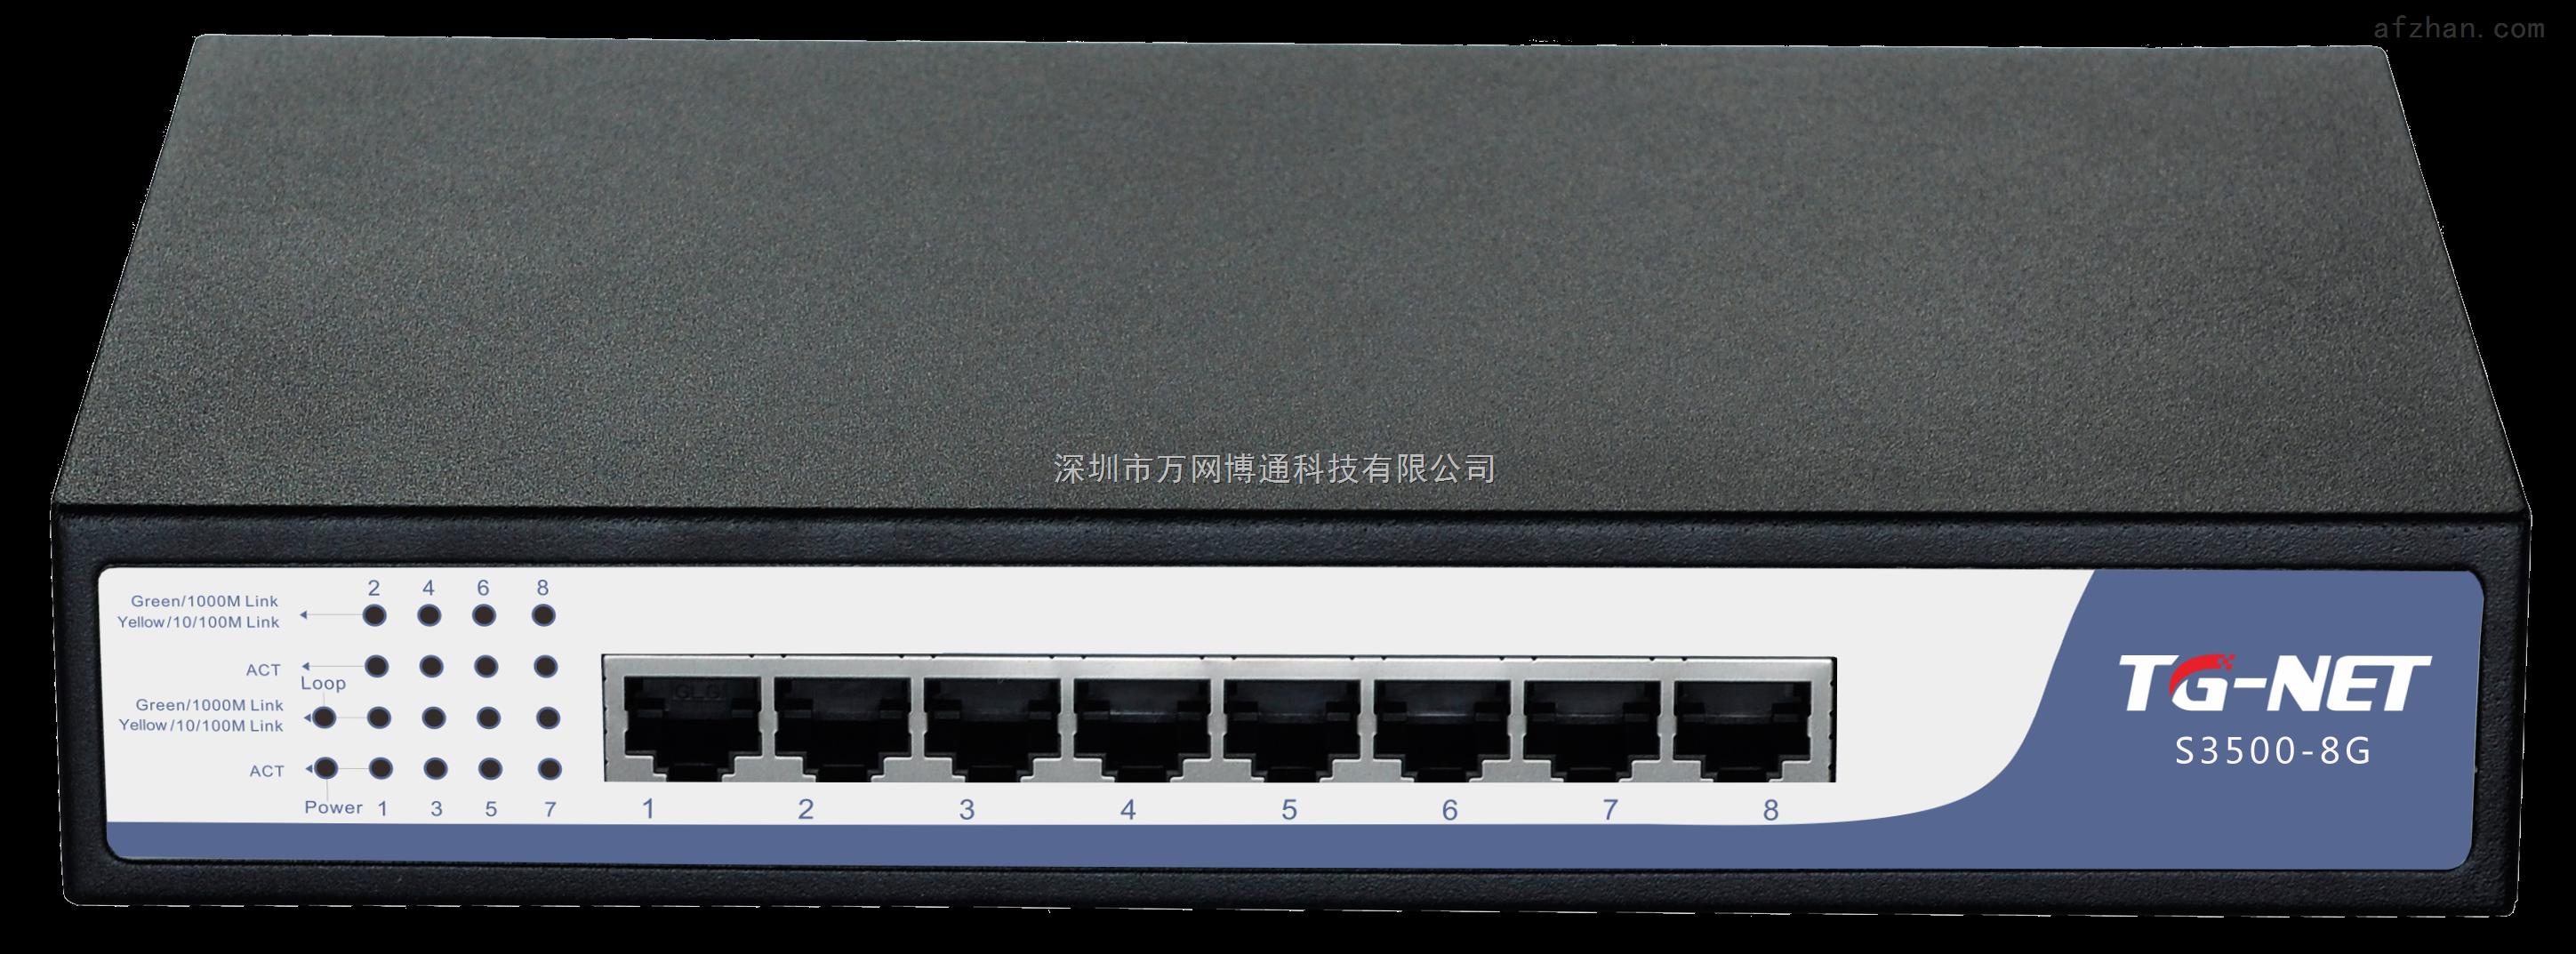 s3500-8g-s3500-8g全千兆管理型交换机价格便宜